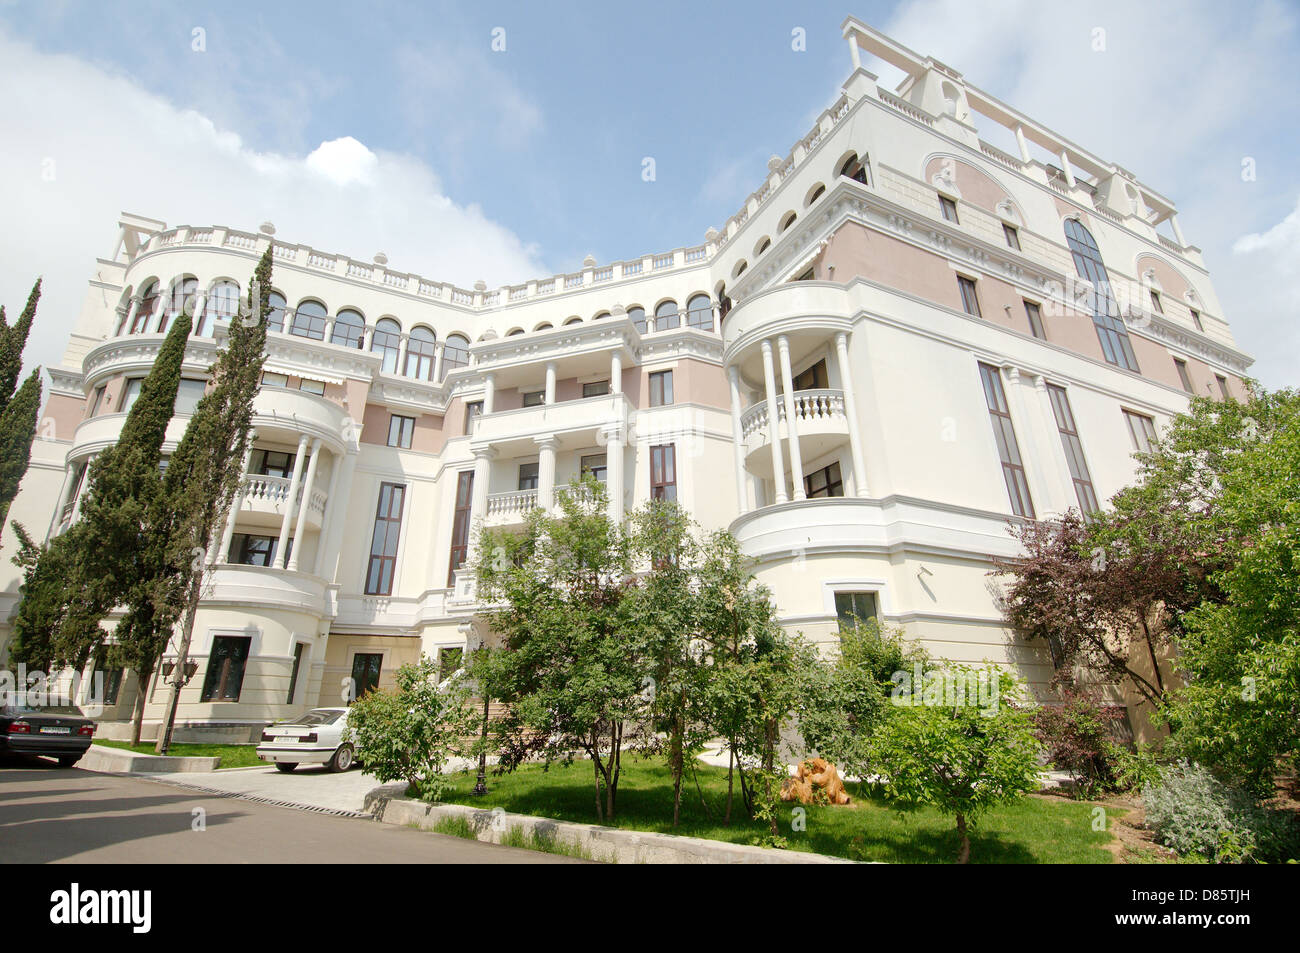 Livadia, The Greater Yalta, Crimea, Ukraine, Eastern Europe - Stock Image